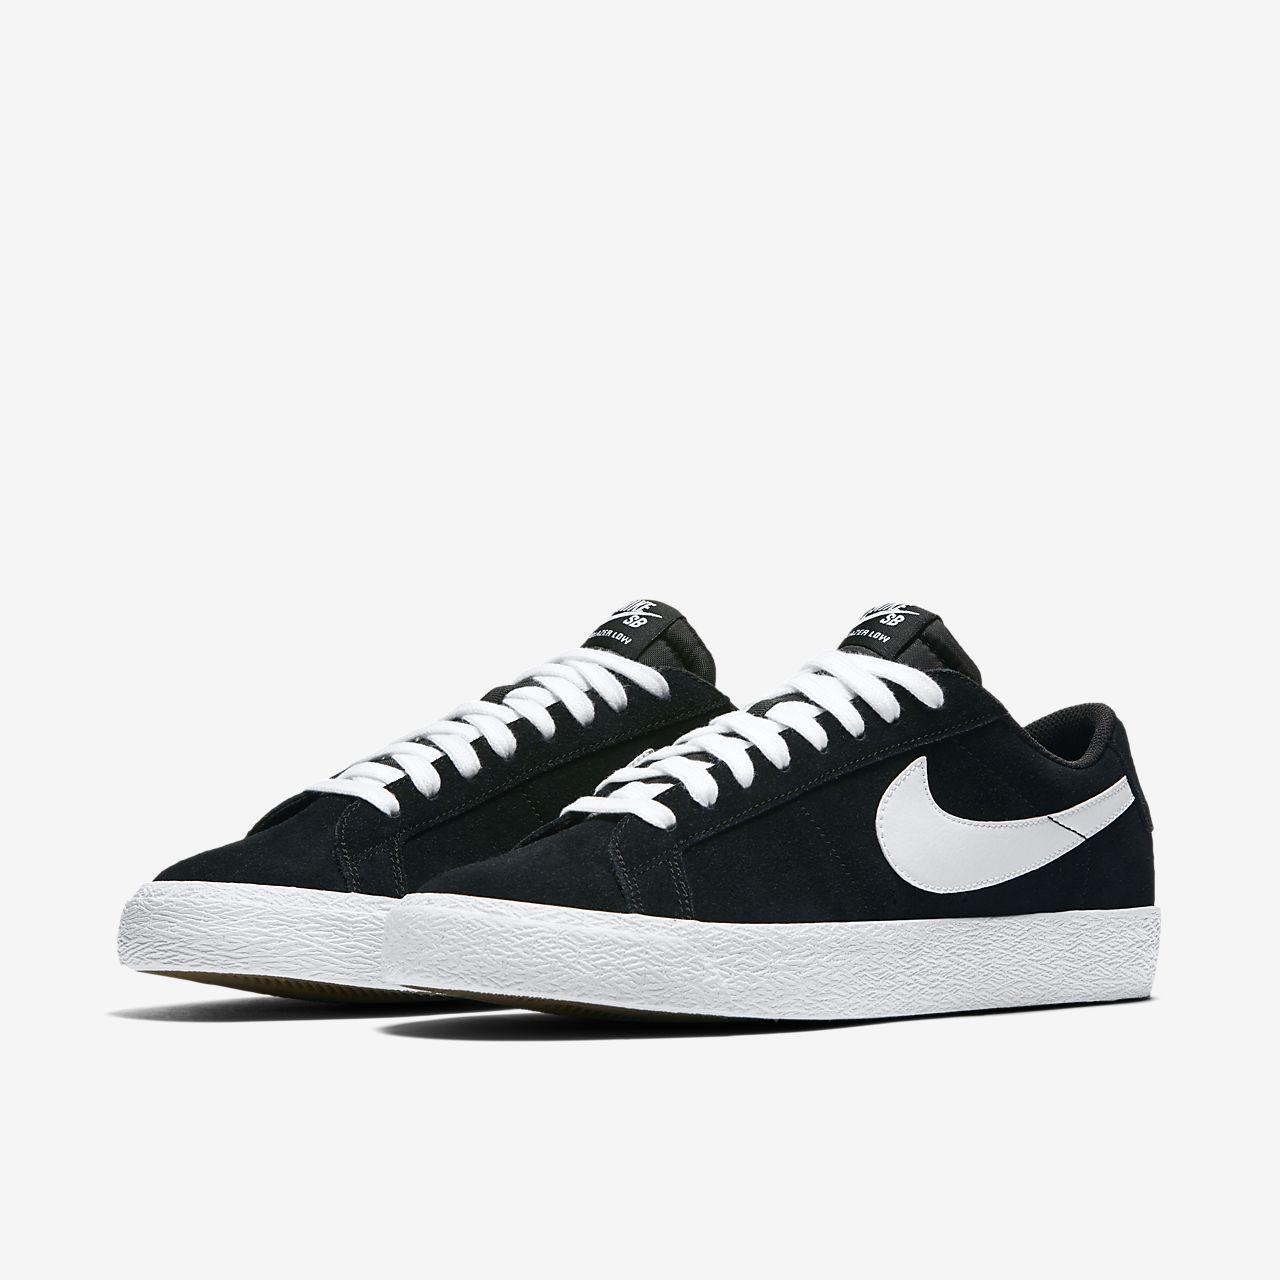 huge selection of 130e4 5b6c5 Nike SB Blazer Zoom Low Mens Skateboarding Shoe